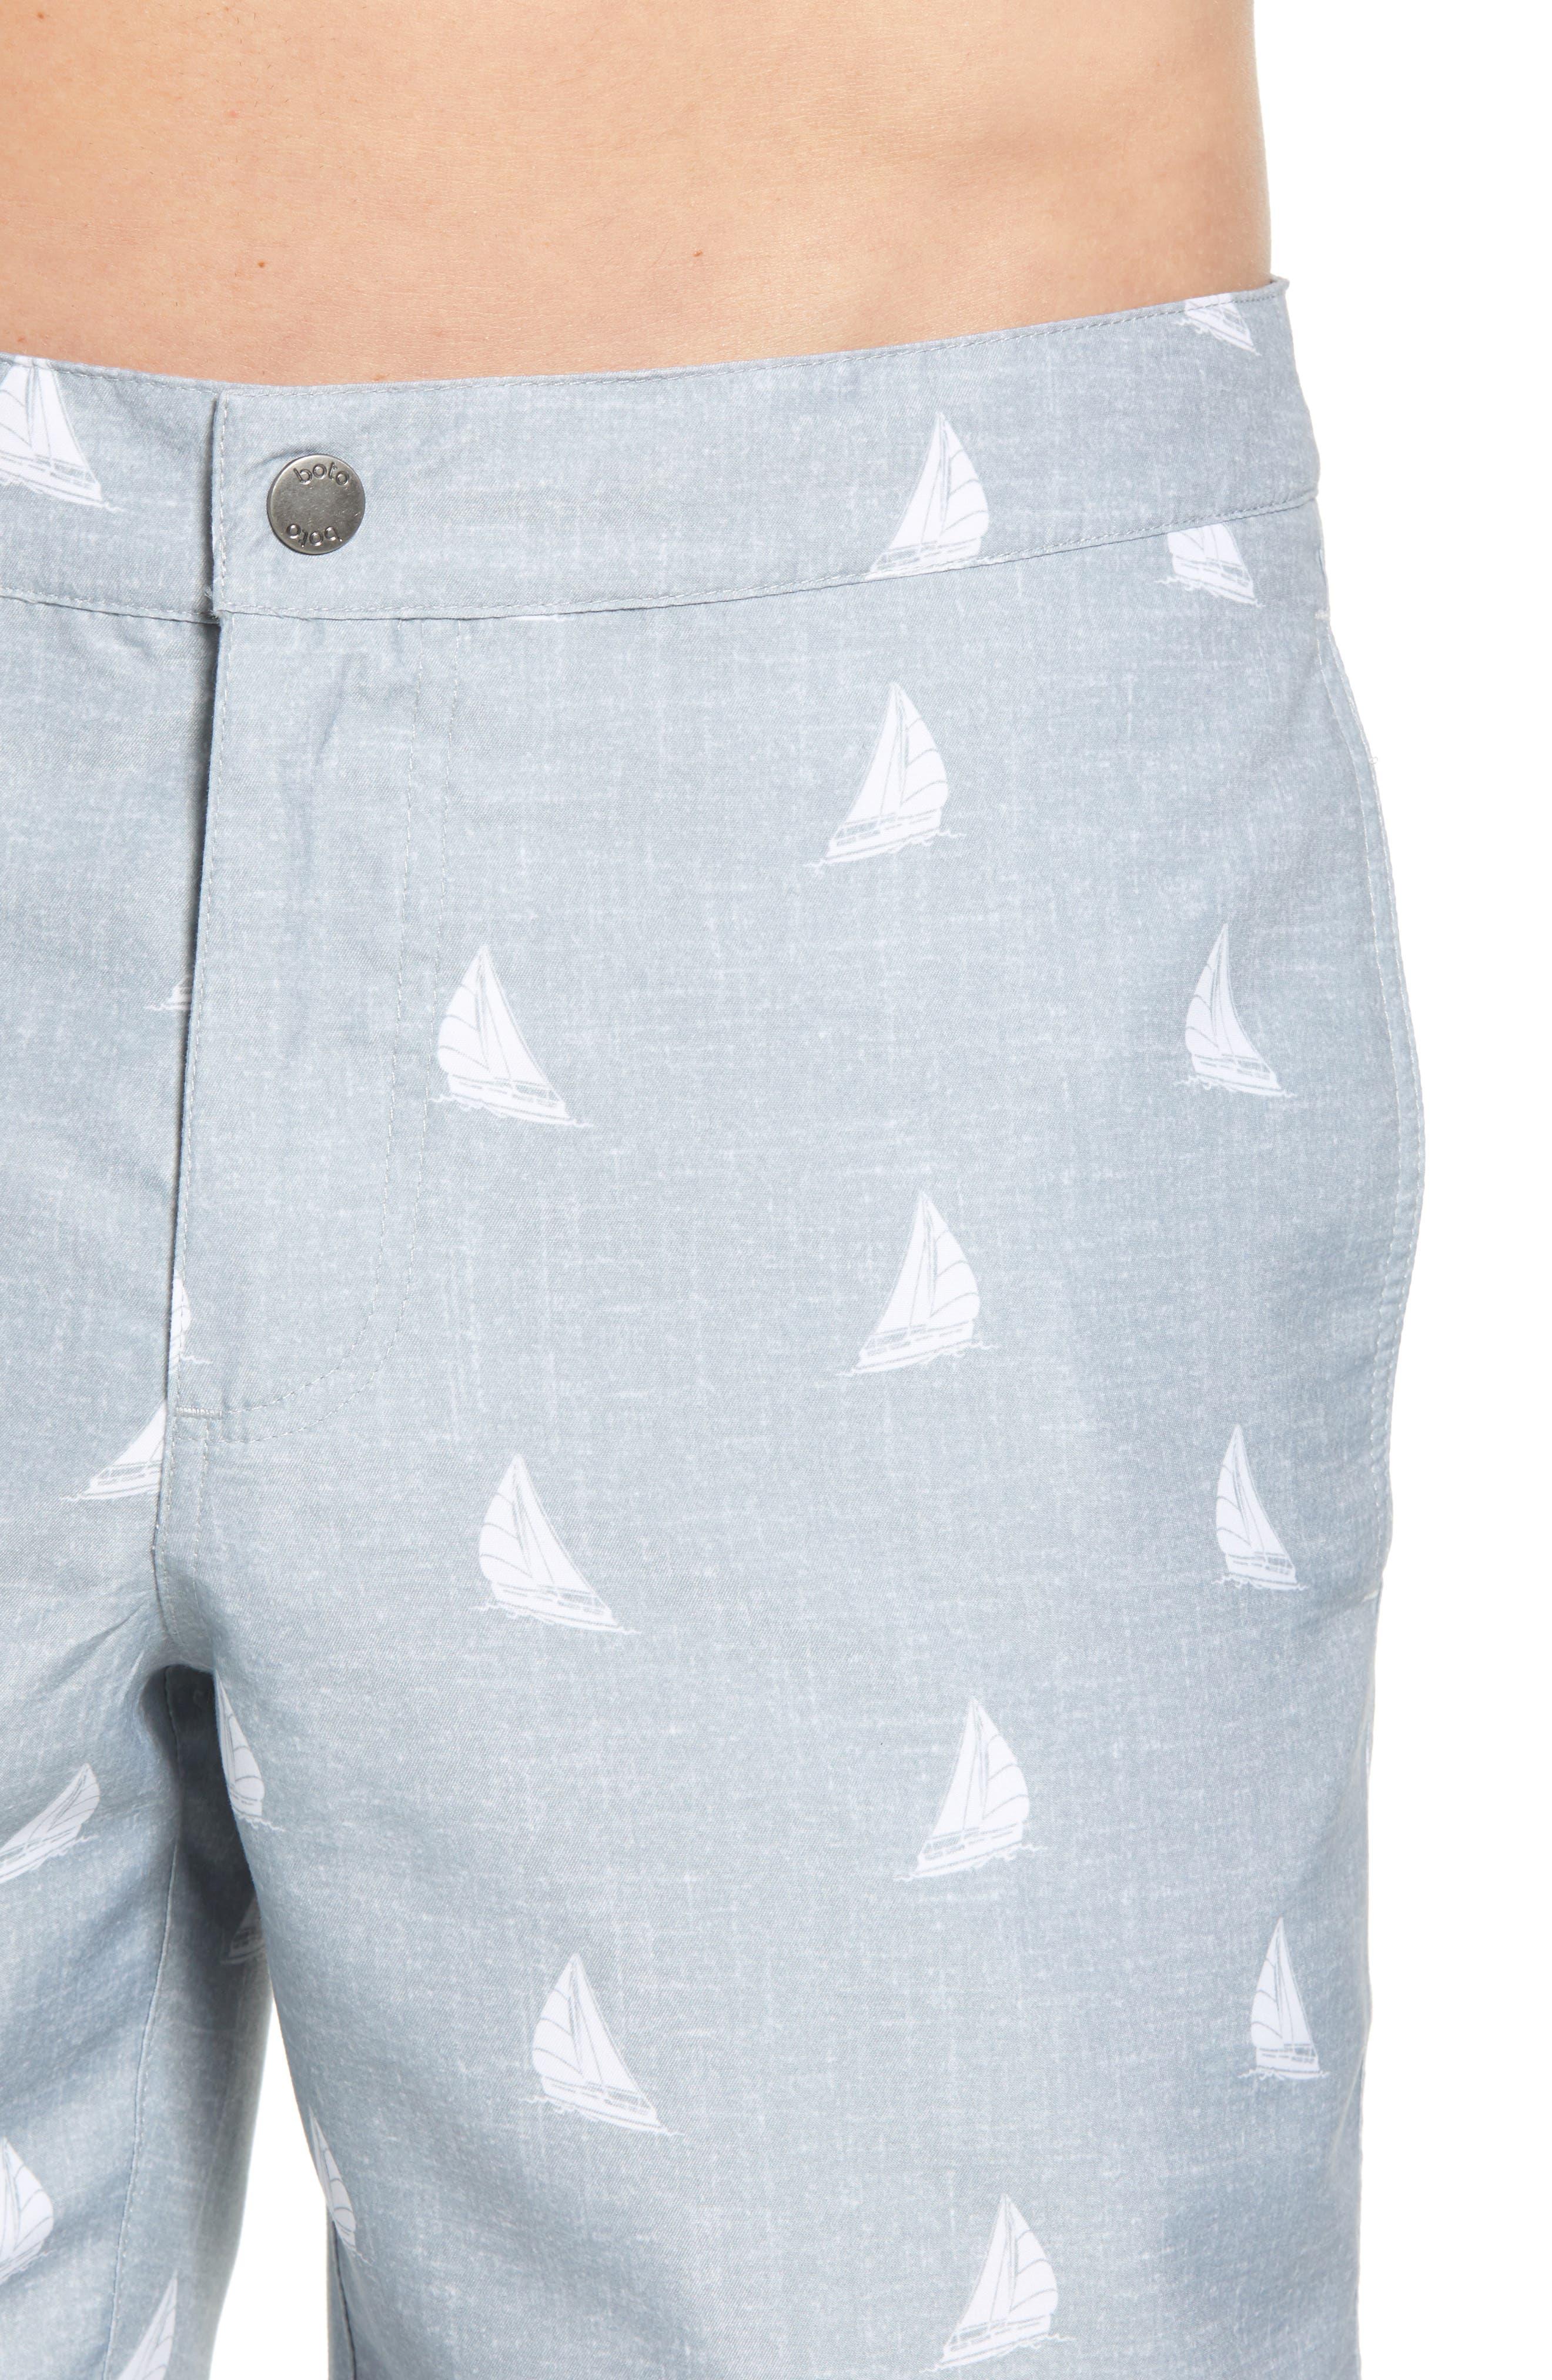 Aruba Slim Fit Swim Trunks,                             Alternate thumbnail 4, color,                             Heathered Grey Sailboats